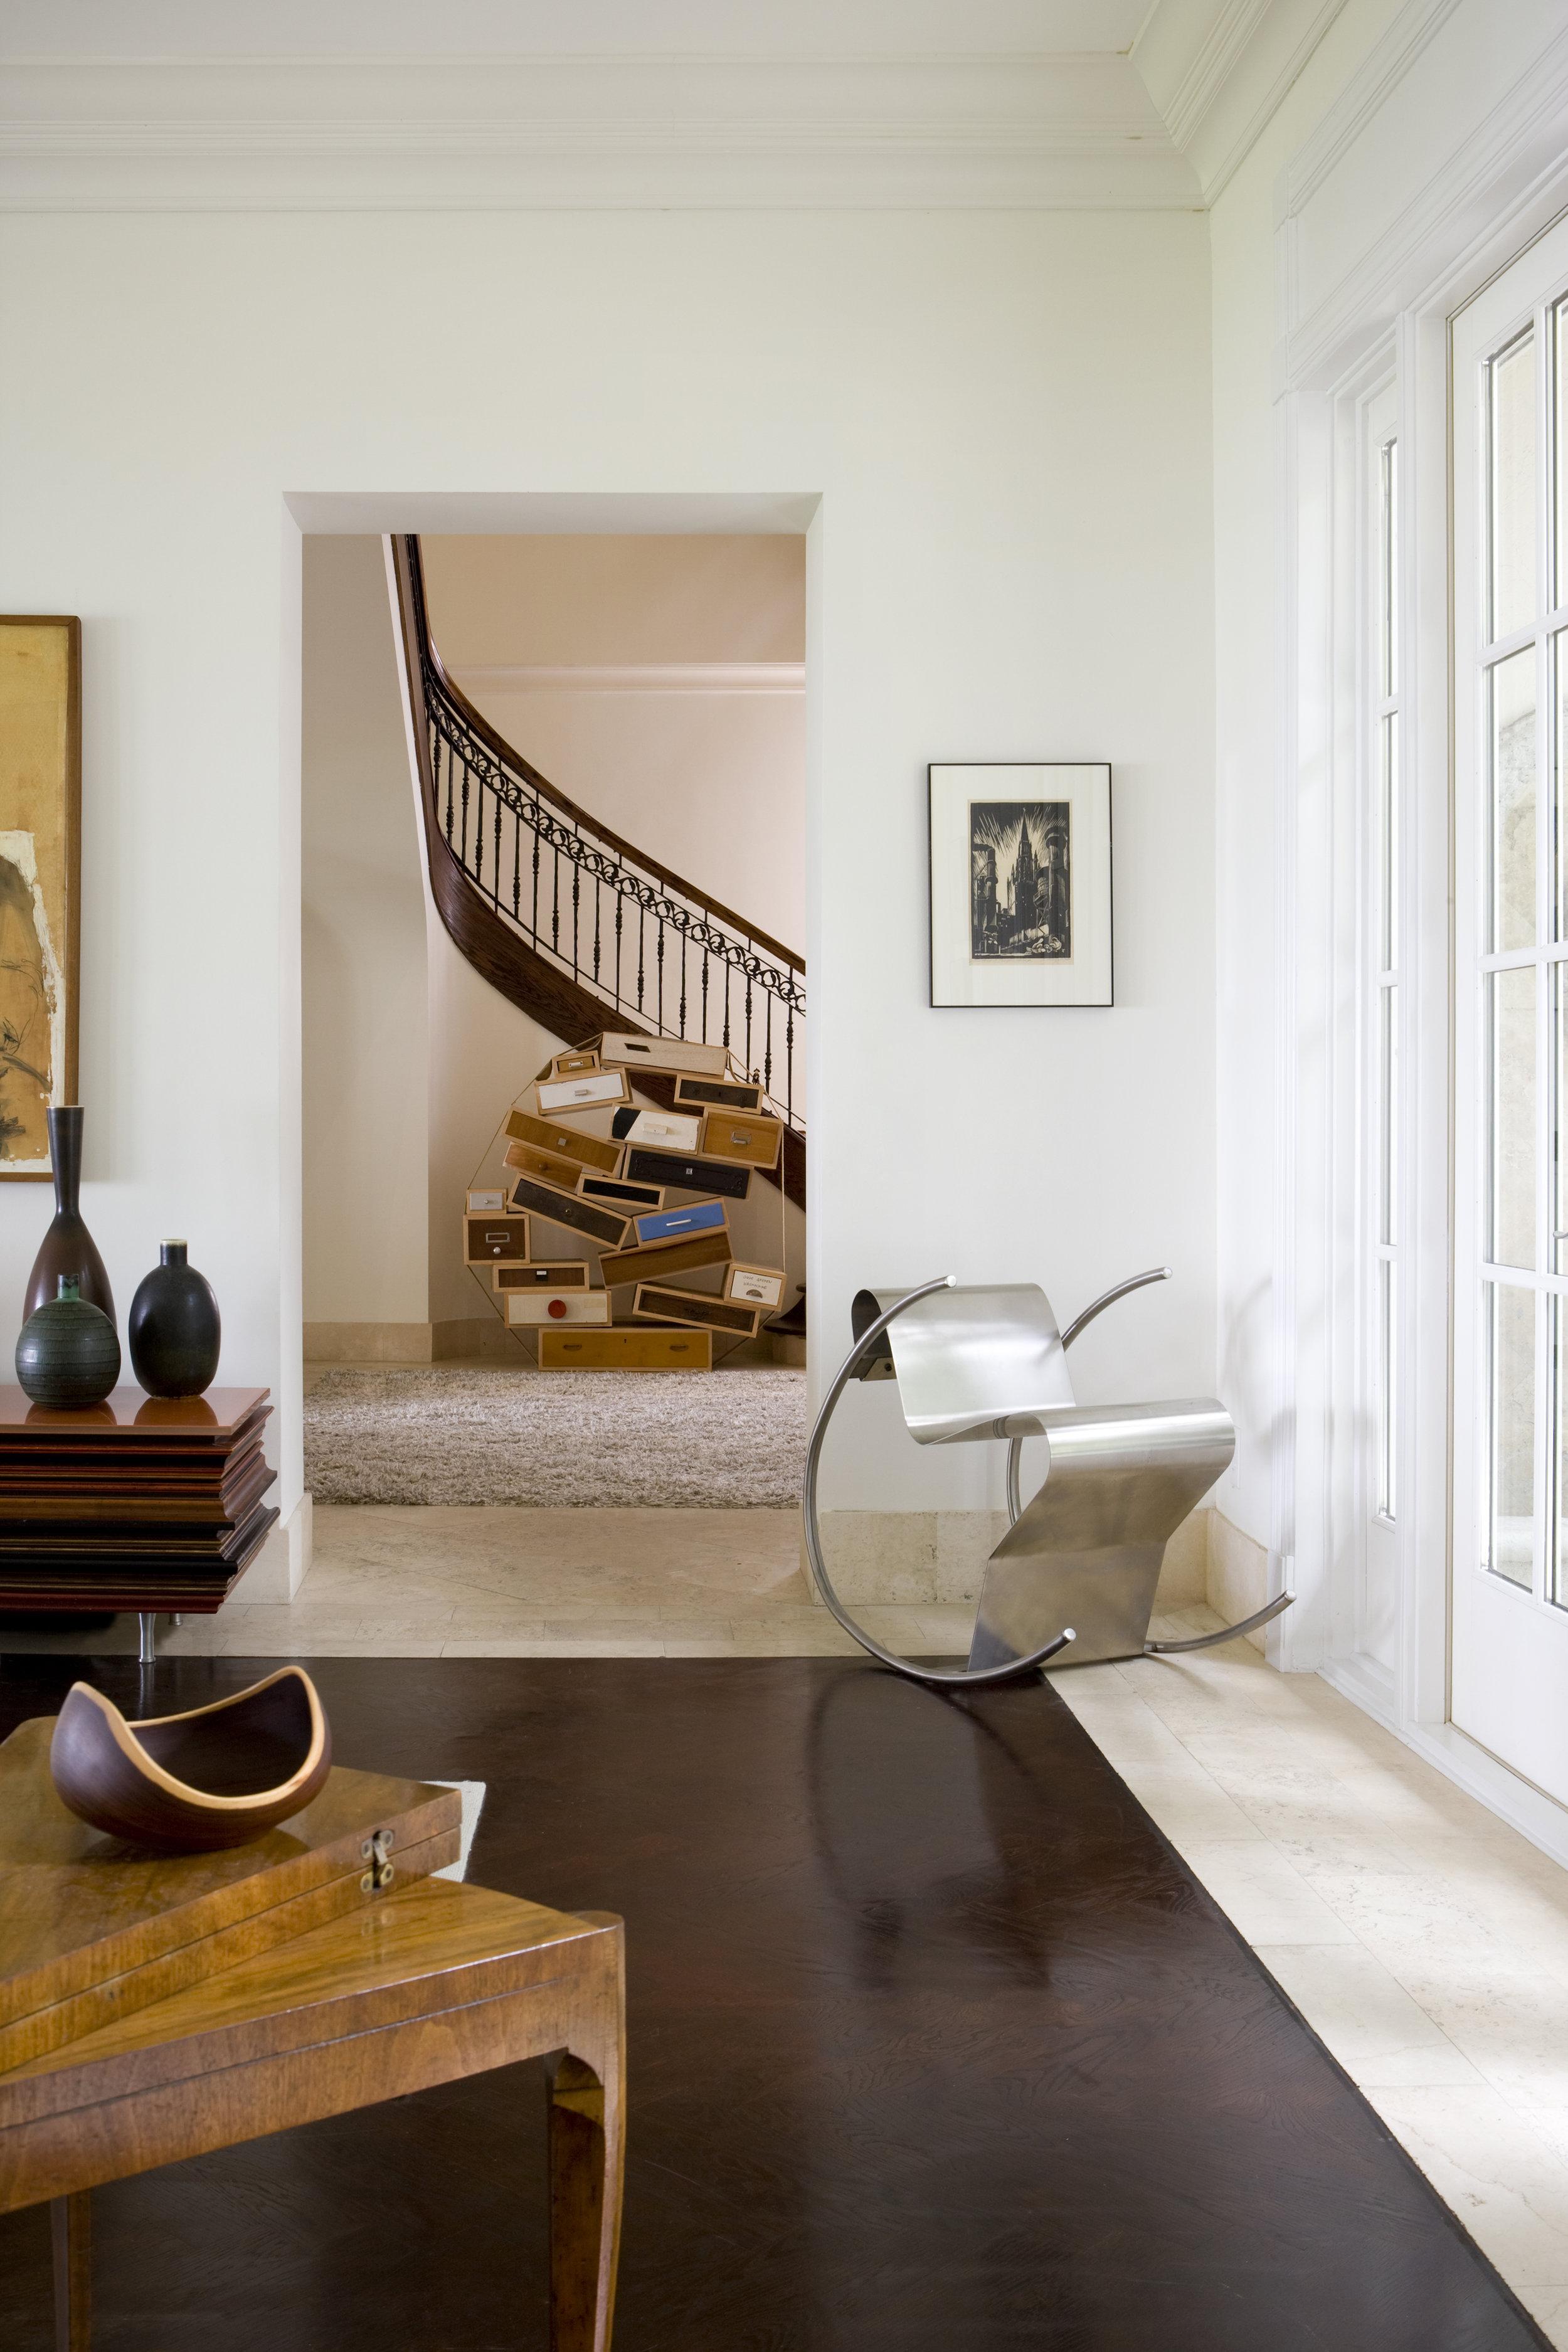 luis-pons-design-interior_1.jpg